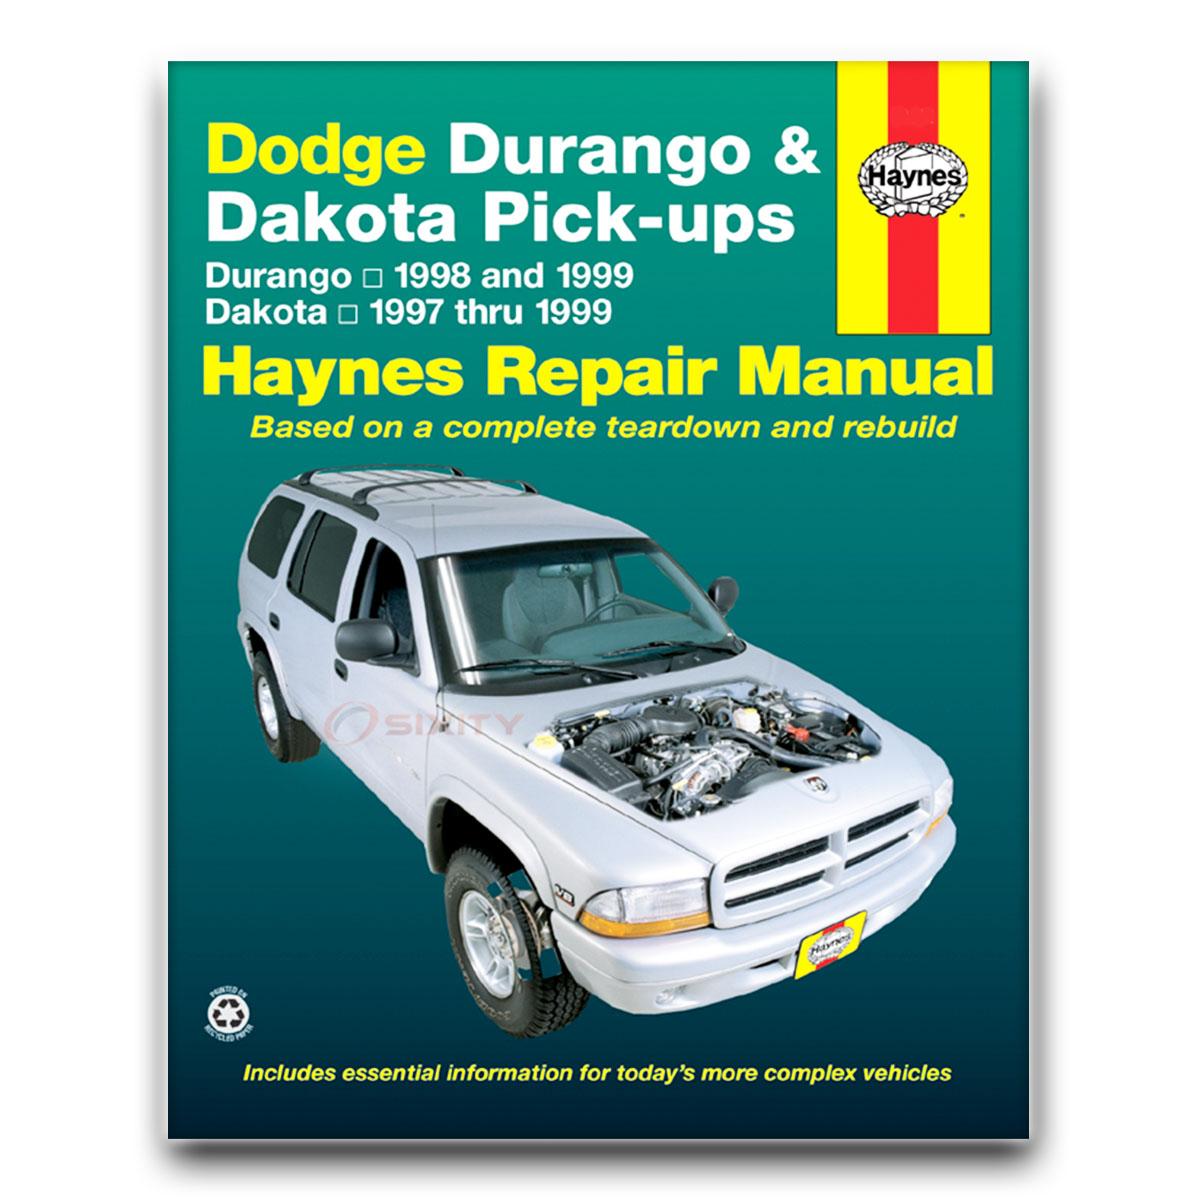 haynes dodge durango 98 99 dakota 97 99 repair manual. Black Bedroom Furniture Sets. Home Design Ideas